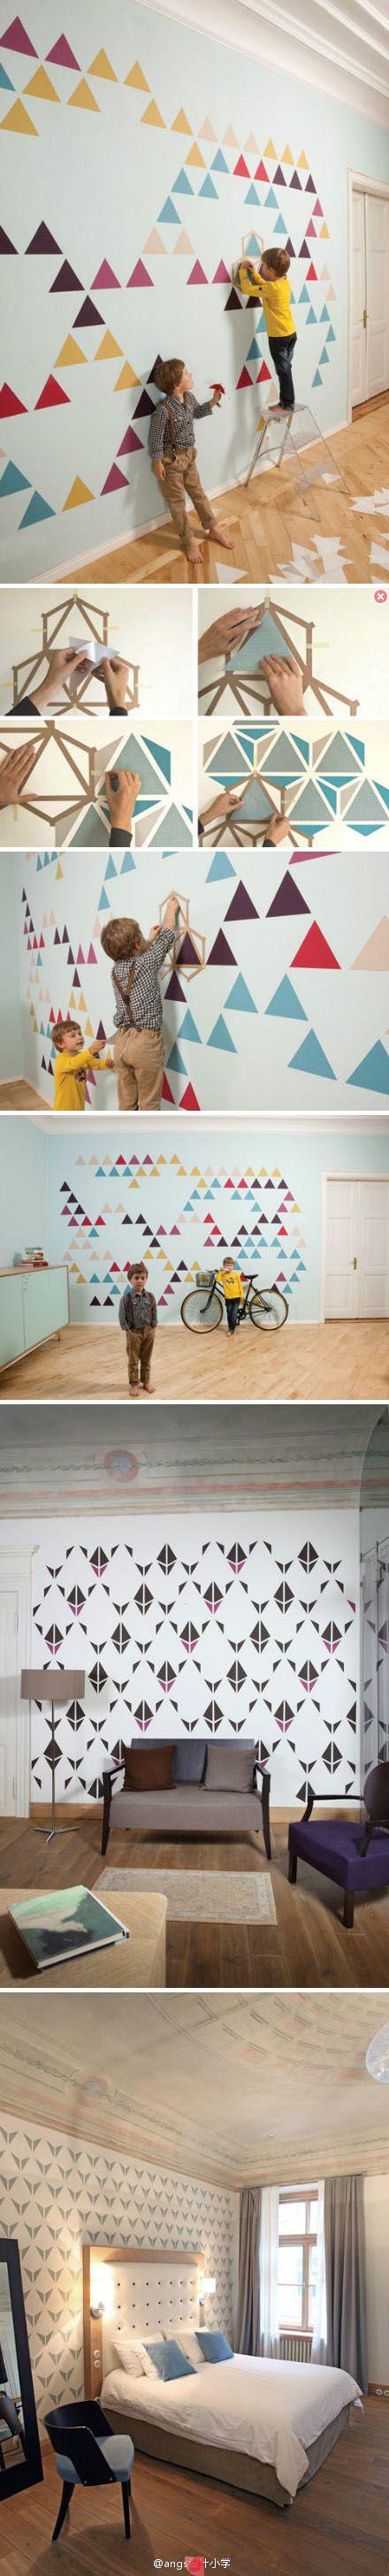 triangles de peinture sur un mur craft pinterest. Black Bedroom Furniture Sets. Home Design Ideas